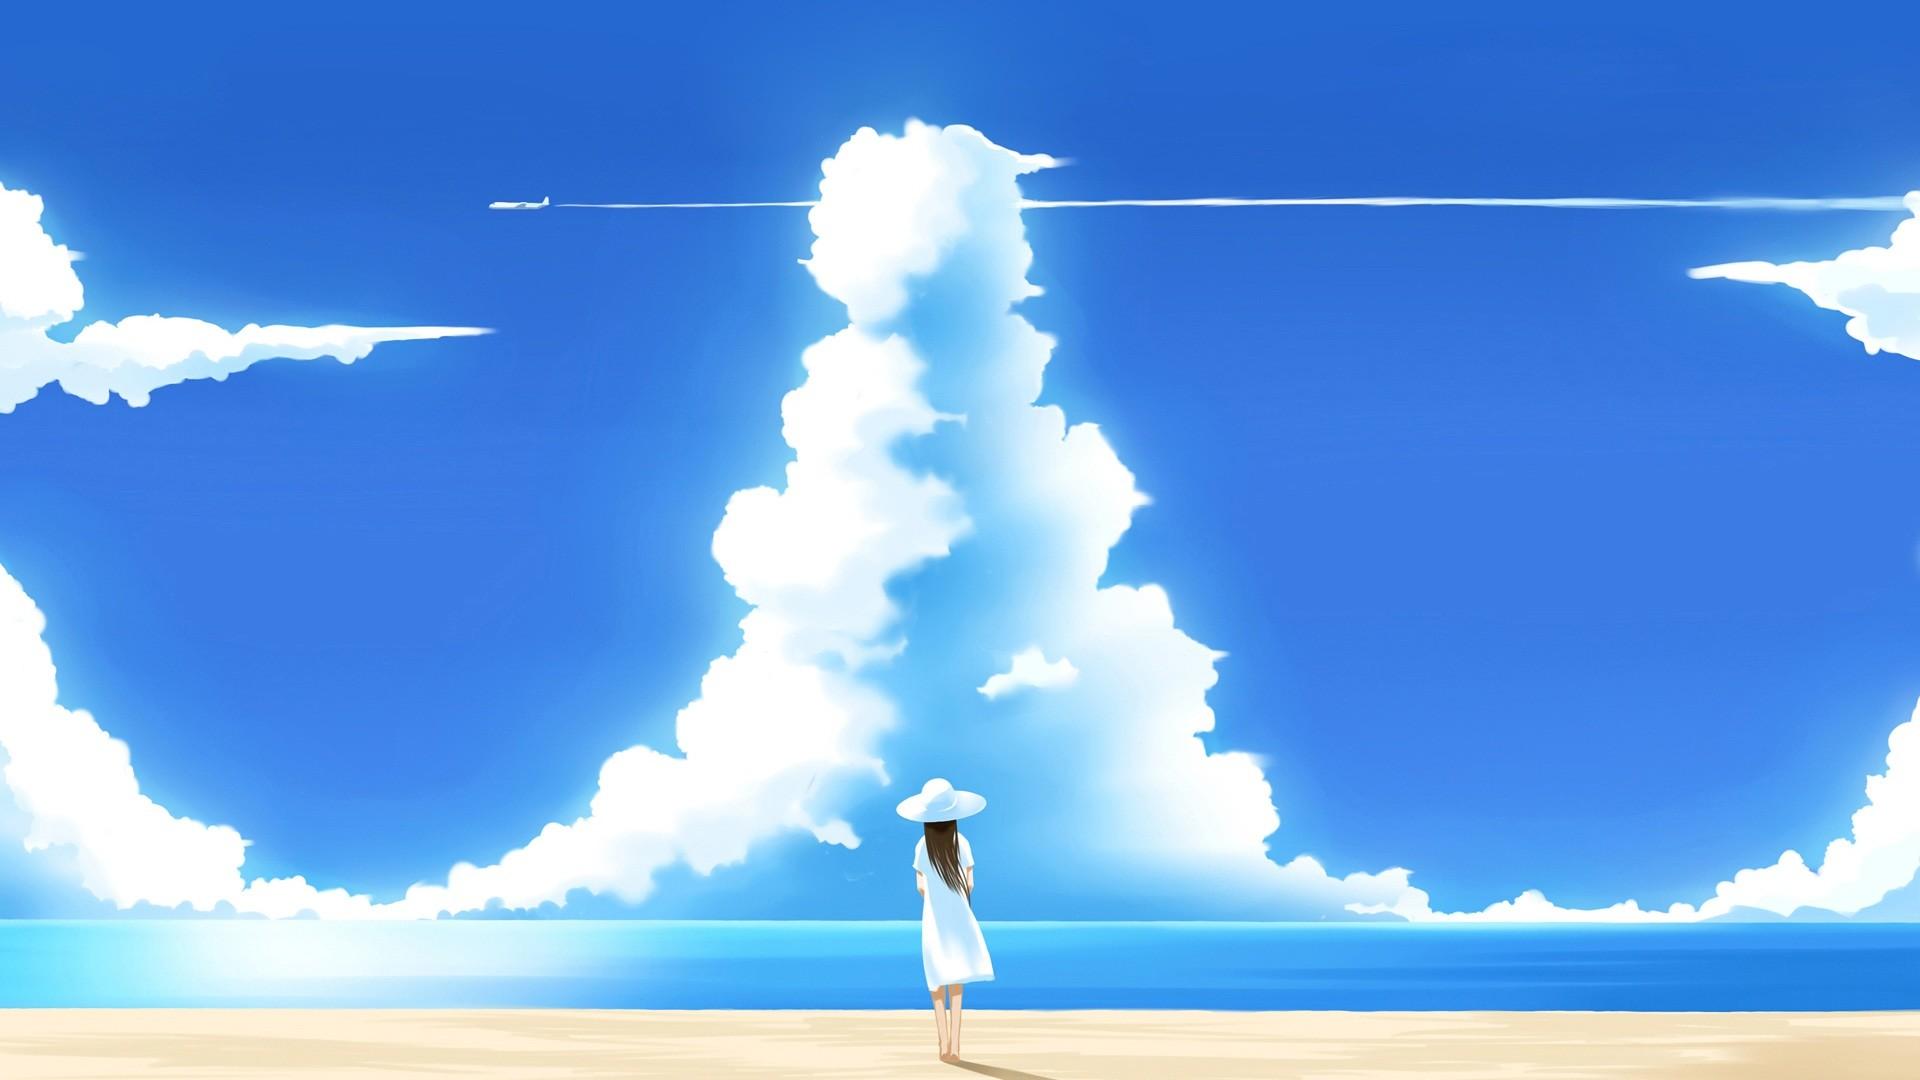 Blue Sky And Sea wallpaper